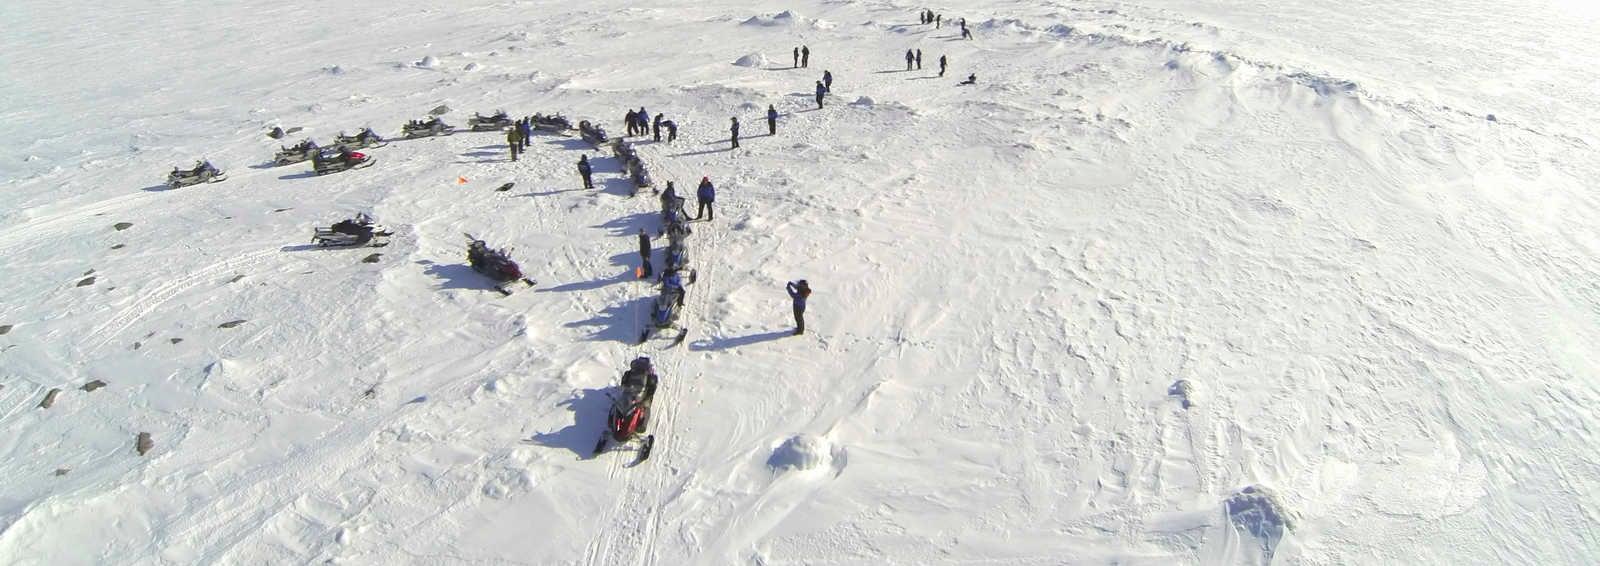 Snowmobiling on the Lulea Archipelago